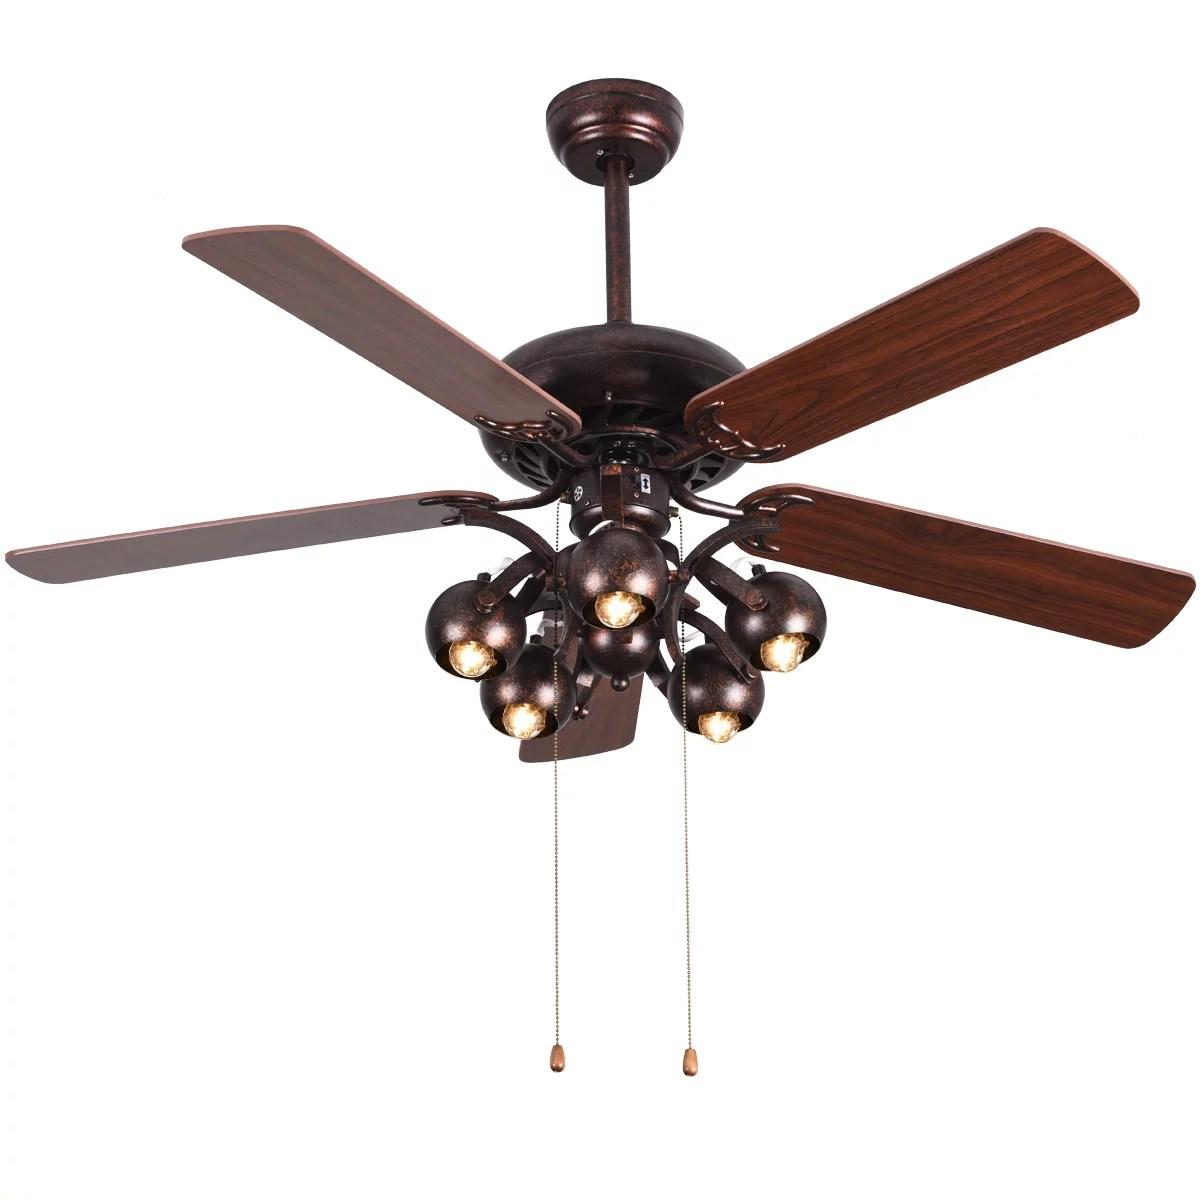 costway 52 vintage rustic ceiling fan light w 5 reversible blades pull chain home walmart com